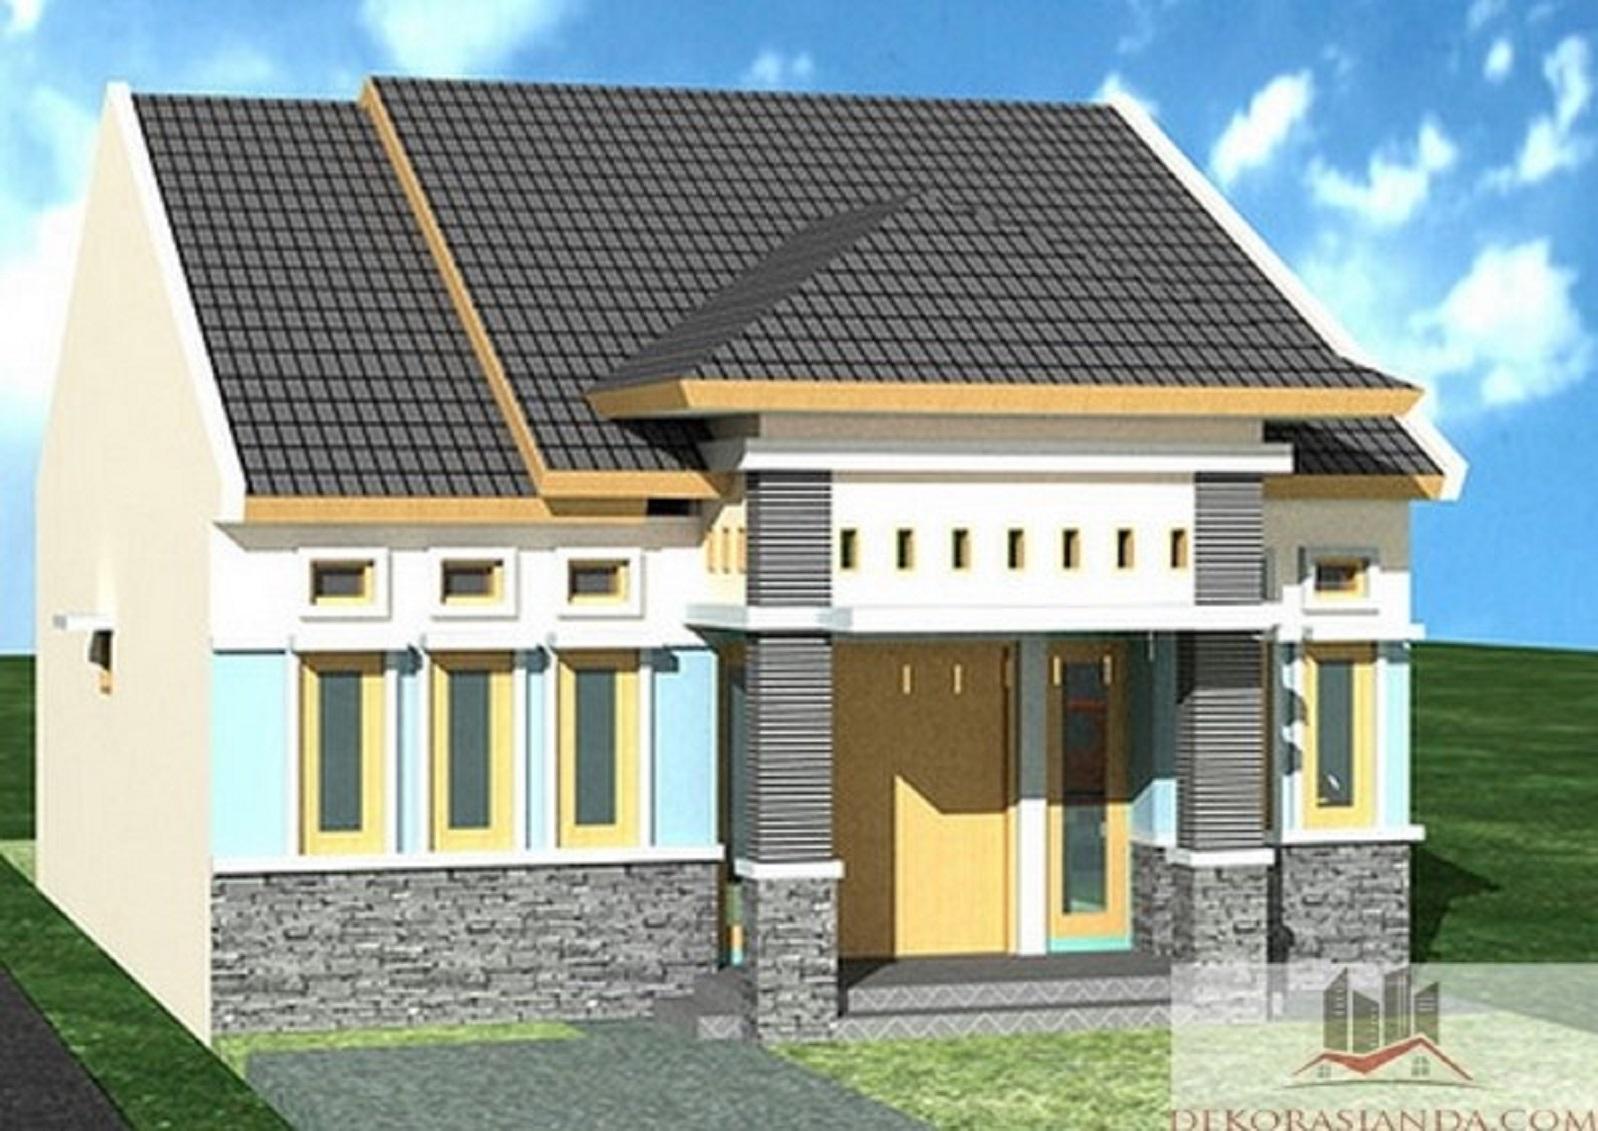 Model Rumah Minimalis Yang Sederhana